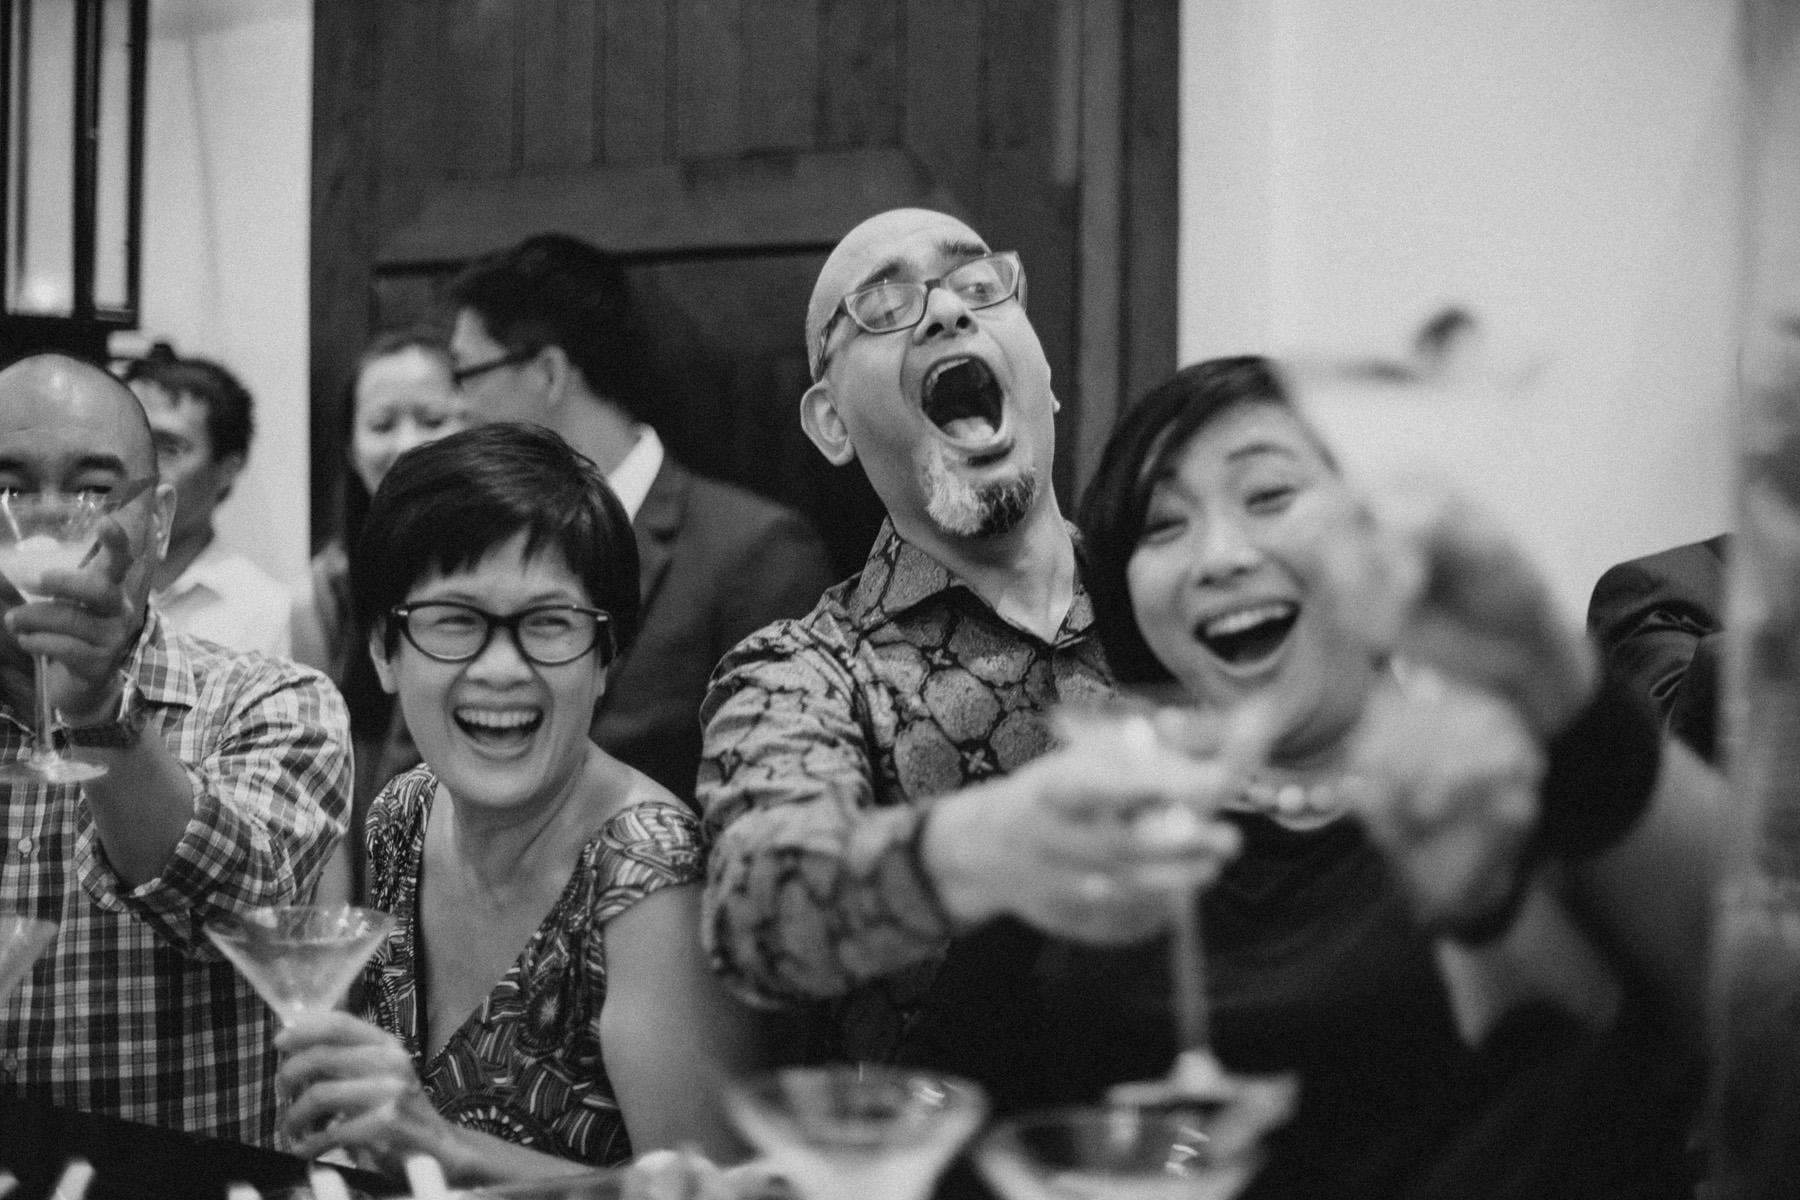 singapore-wedding-travel-photographer-faith-alvin-wedding-wmt-48.jpg